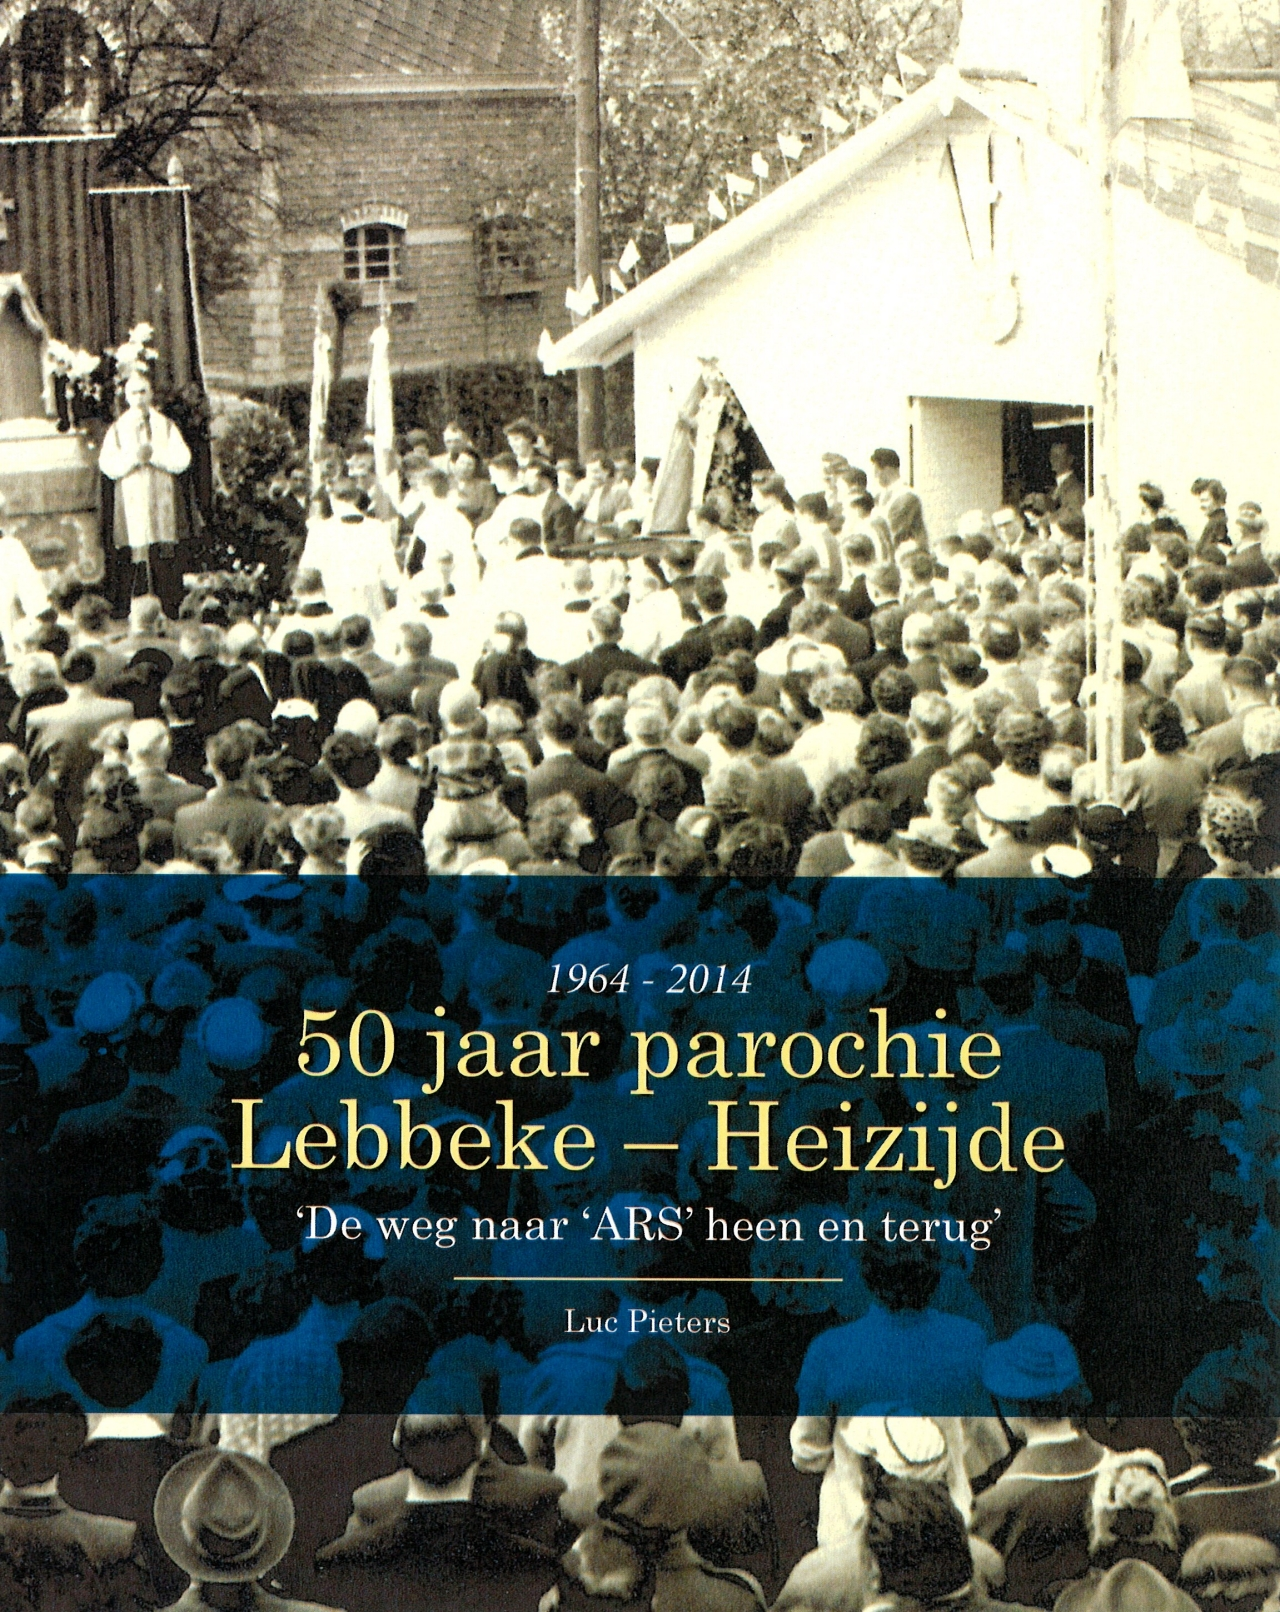 Cover boek 50 jaar parochiekerk lebbeke-heizijde